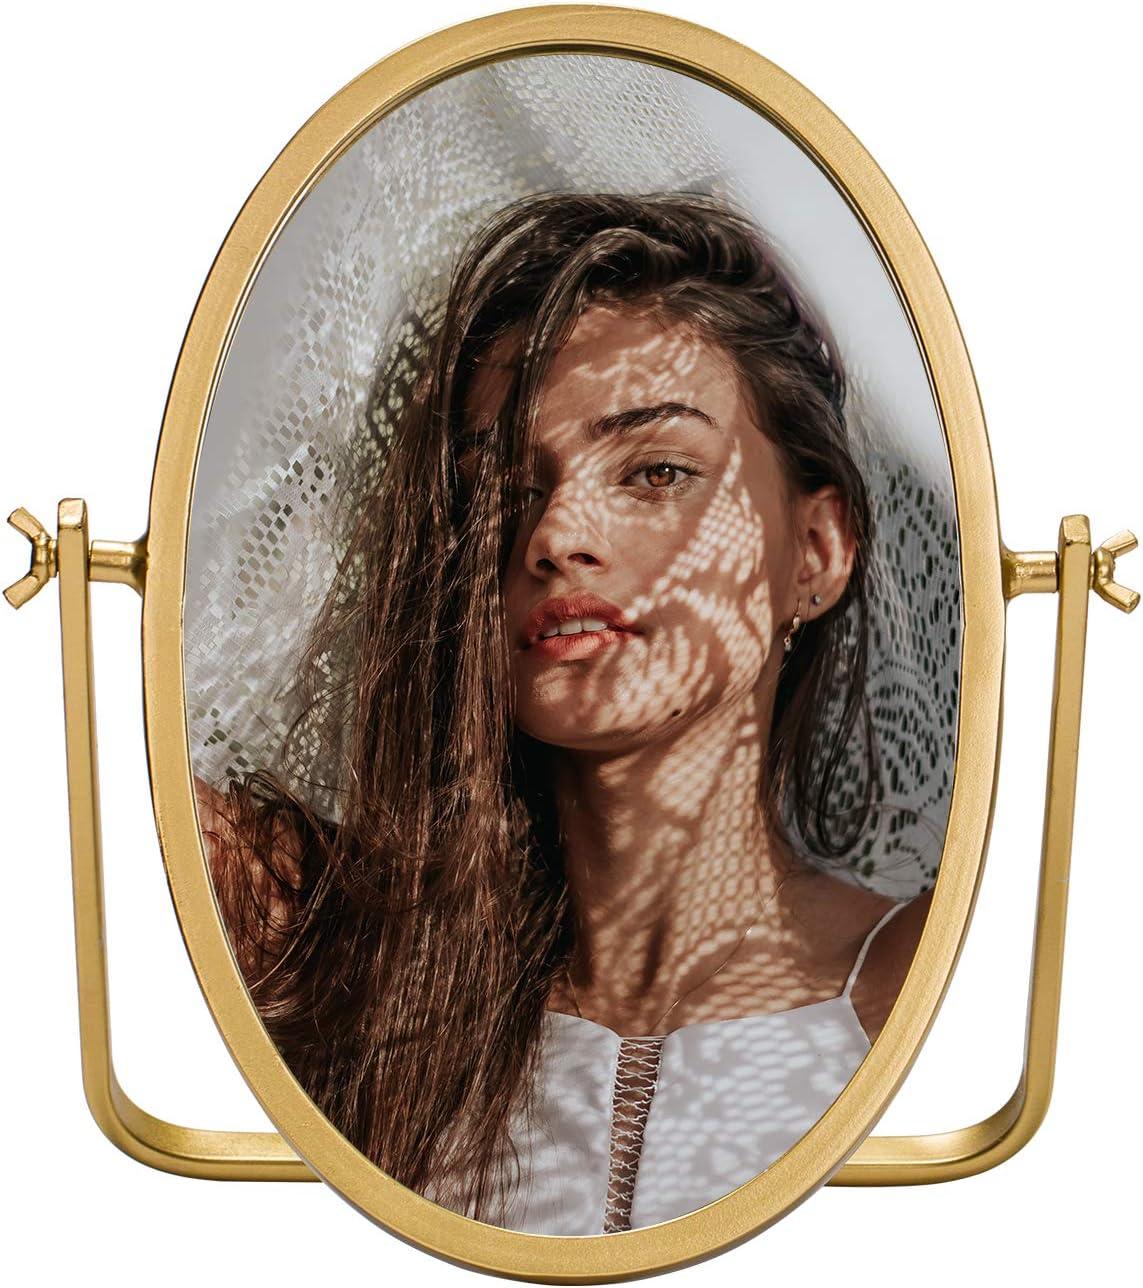 "Geloo Vanity Vintage Makeup Mirror-Oval Desk Mirror Boho Decor 360 Degree Swivel Mirror, 10"" Small Stand Mirror Metal Brushed Modern Gold Finish for Bathroom,Bedroom,Table,Tabletop,Antique,Dresser"